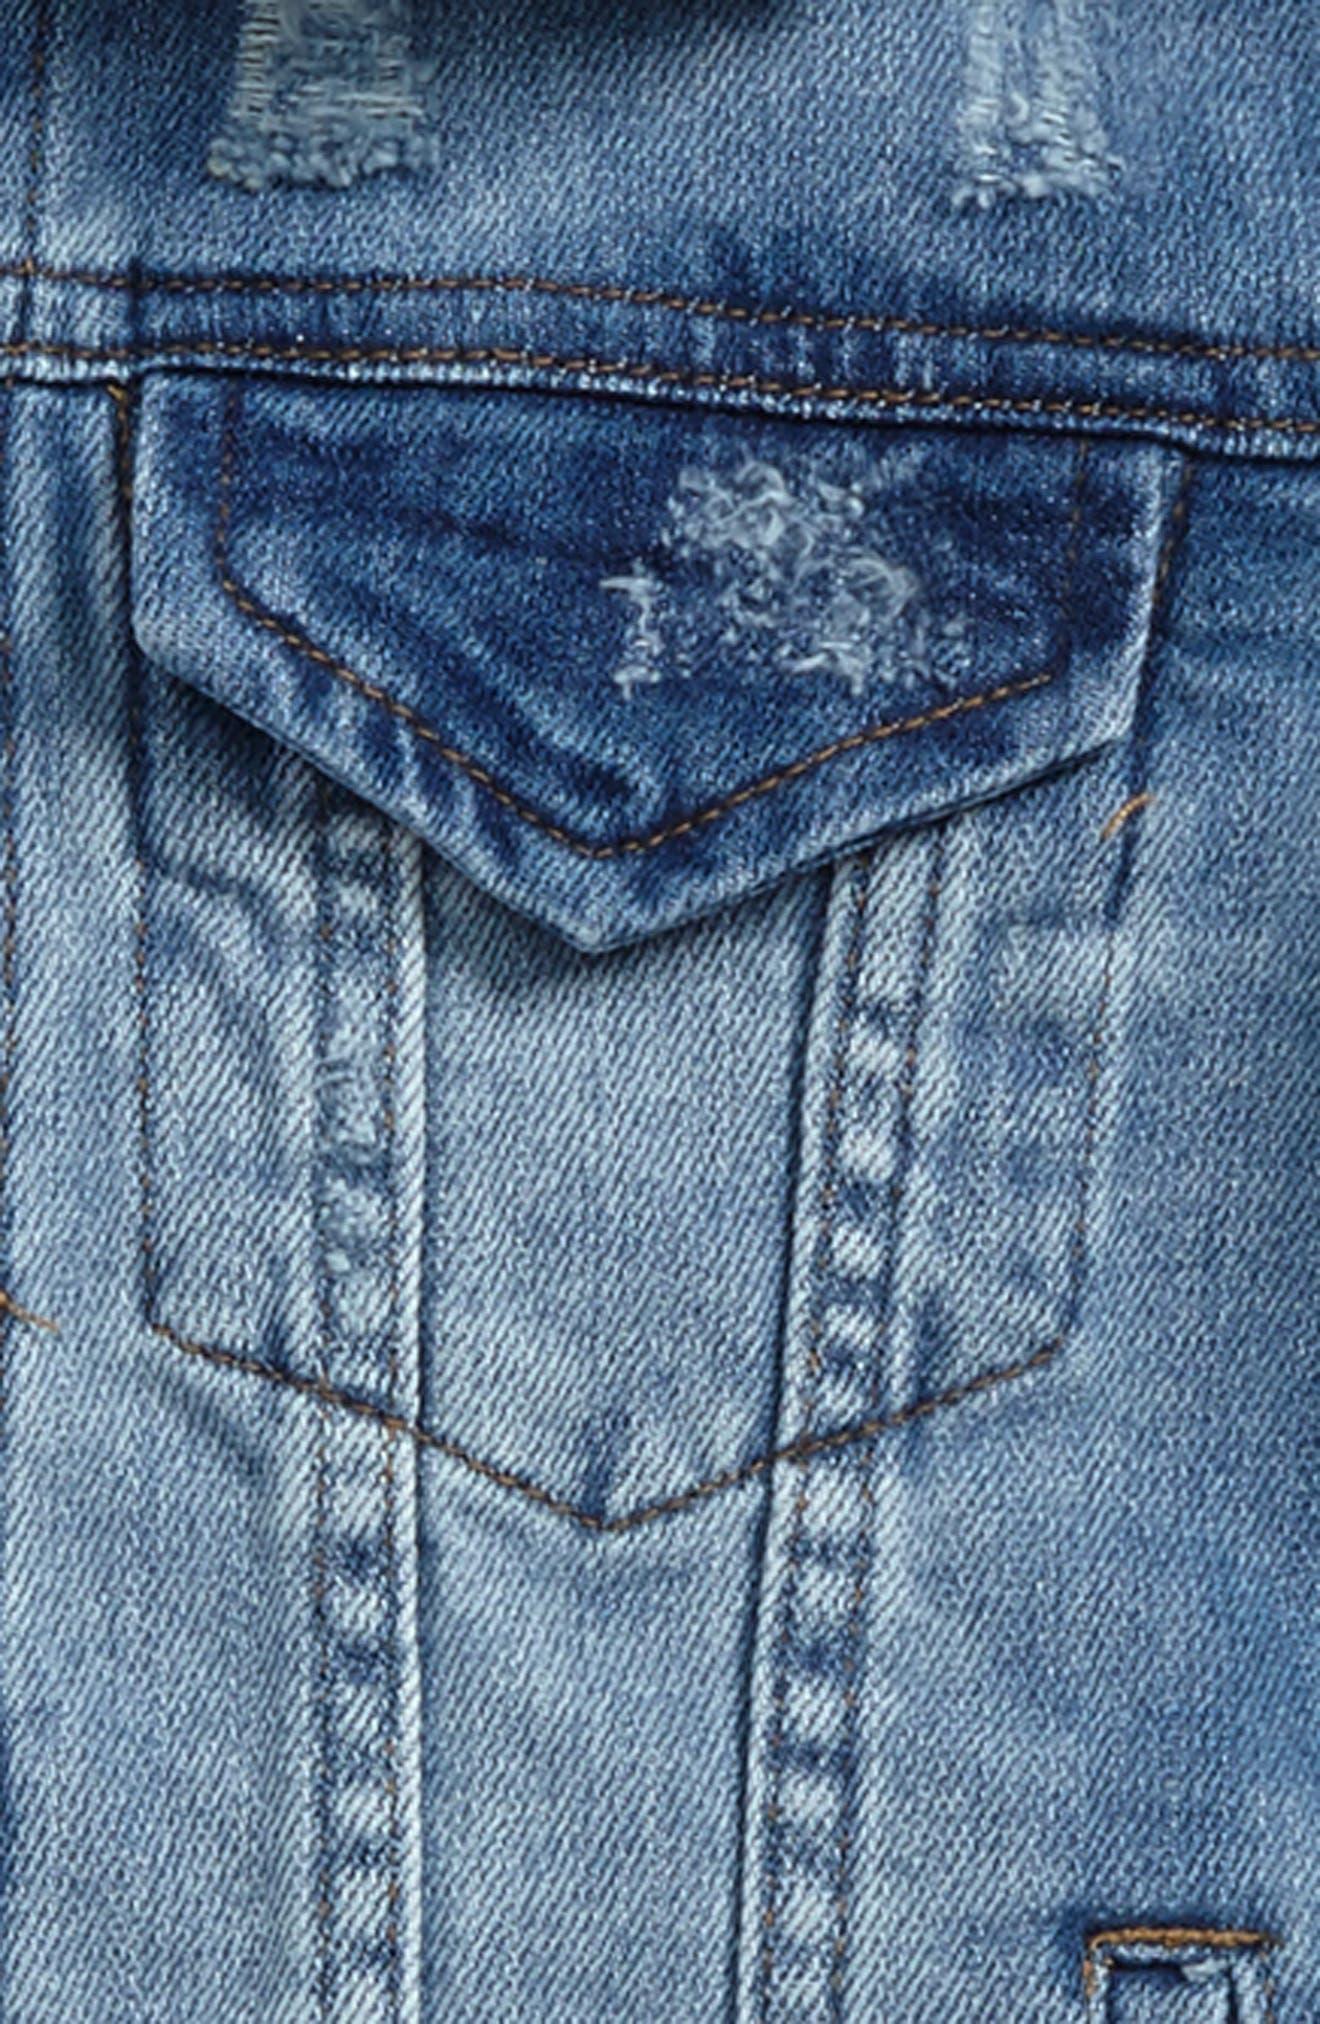 Decon Denim Jacket,                             Alternate thumbnail 2, color,                             Indigo